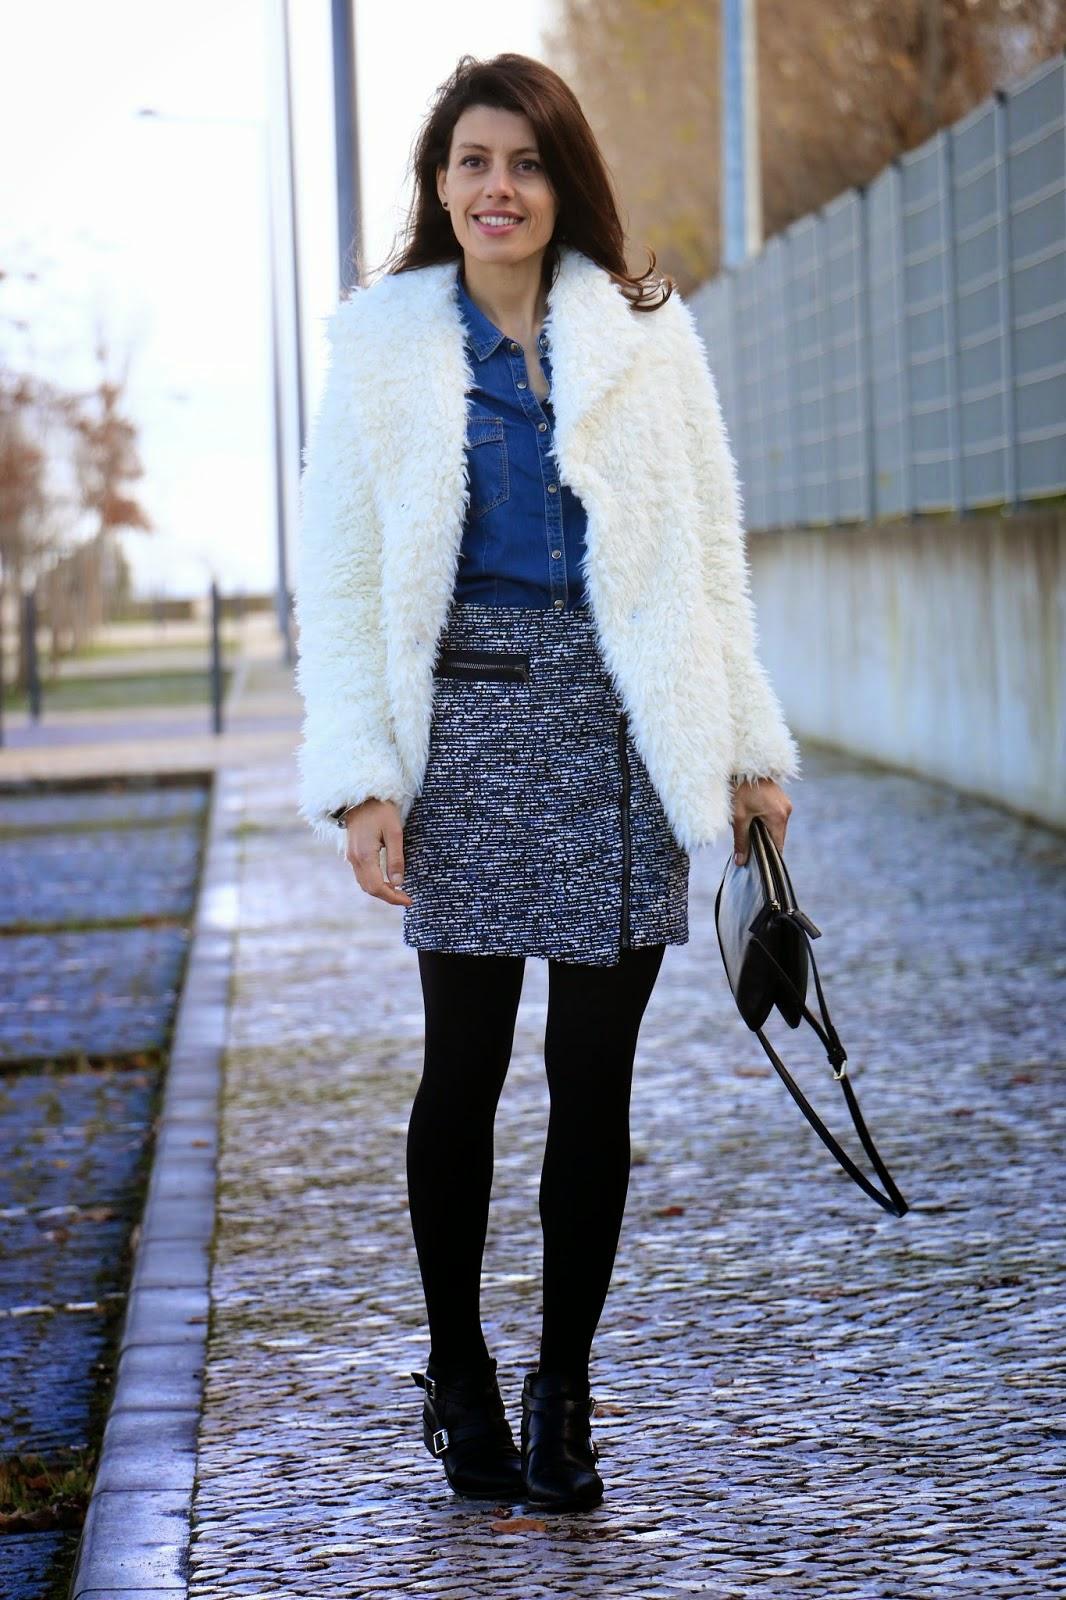 http://ilovefitametrica.blogspot.pt/2015/01/fluffy-coat.html